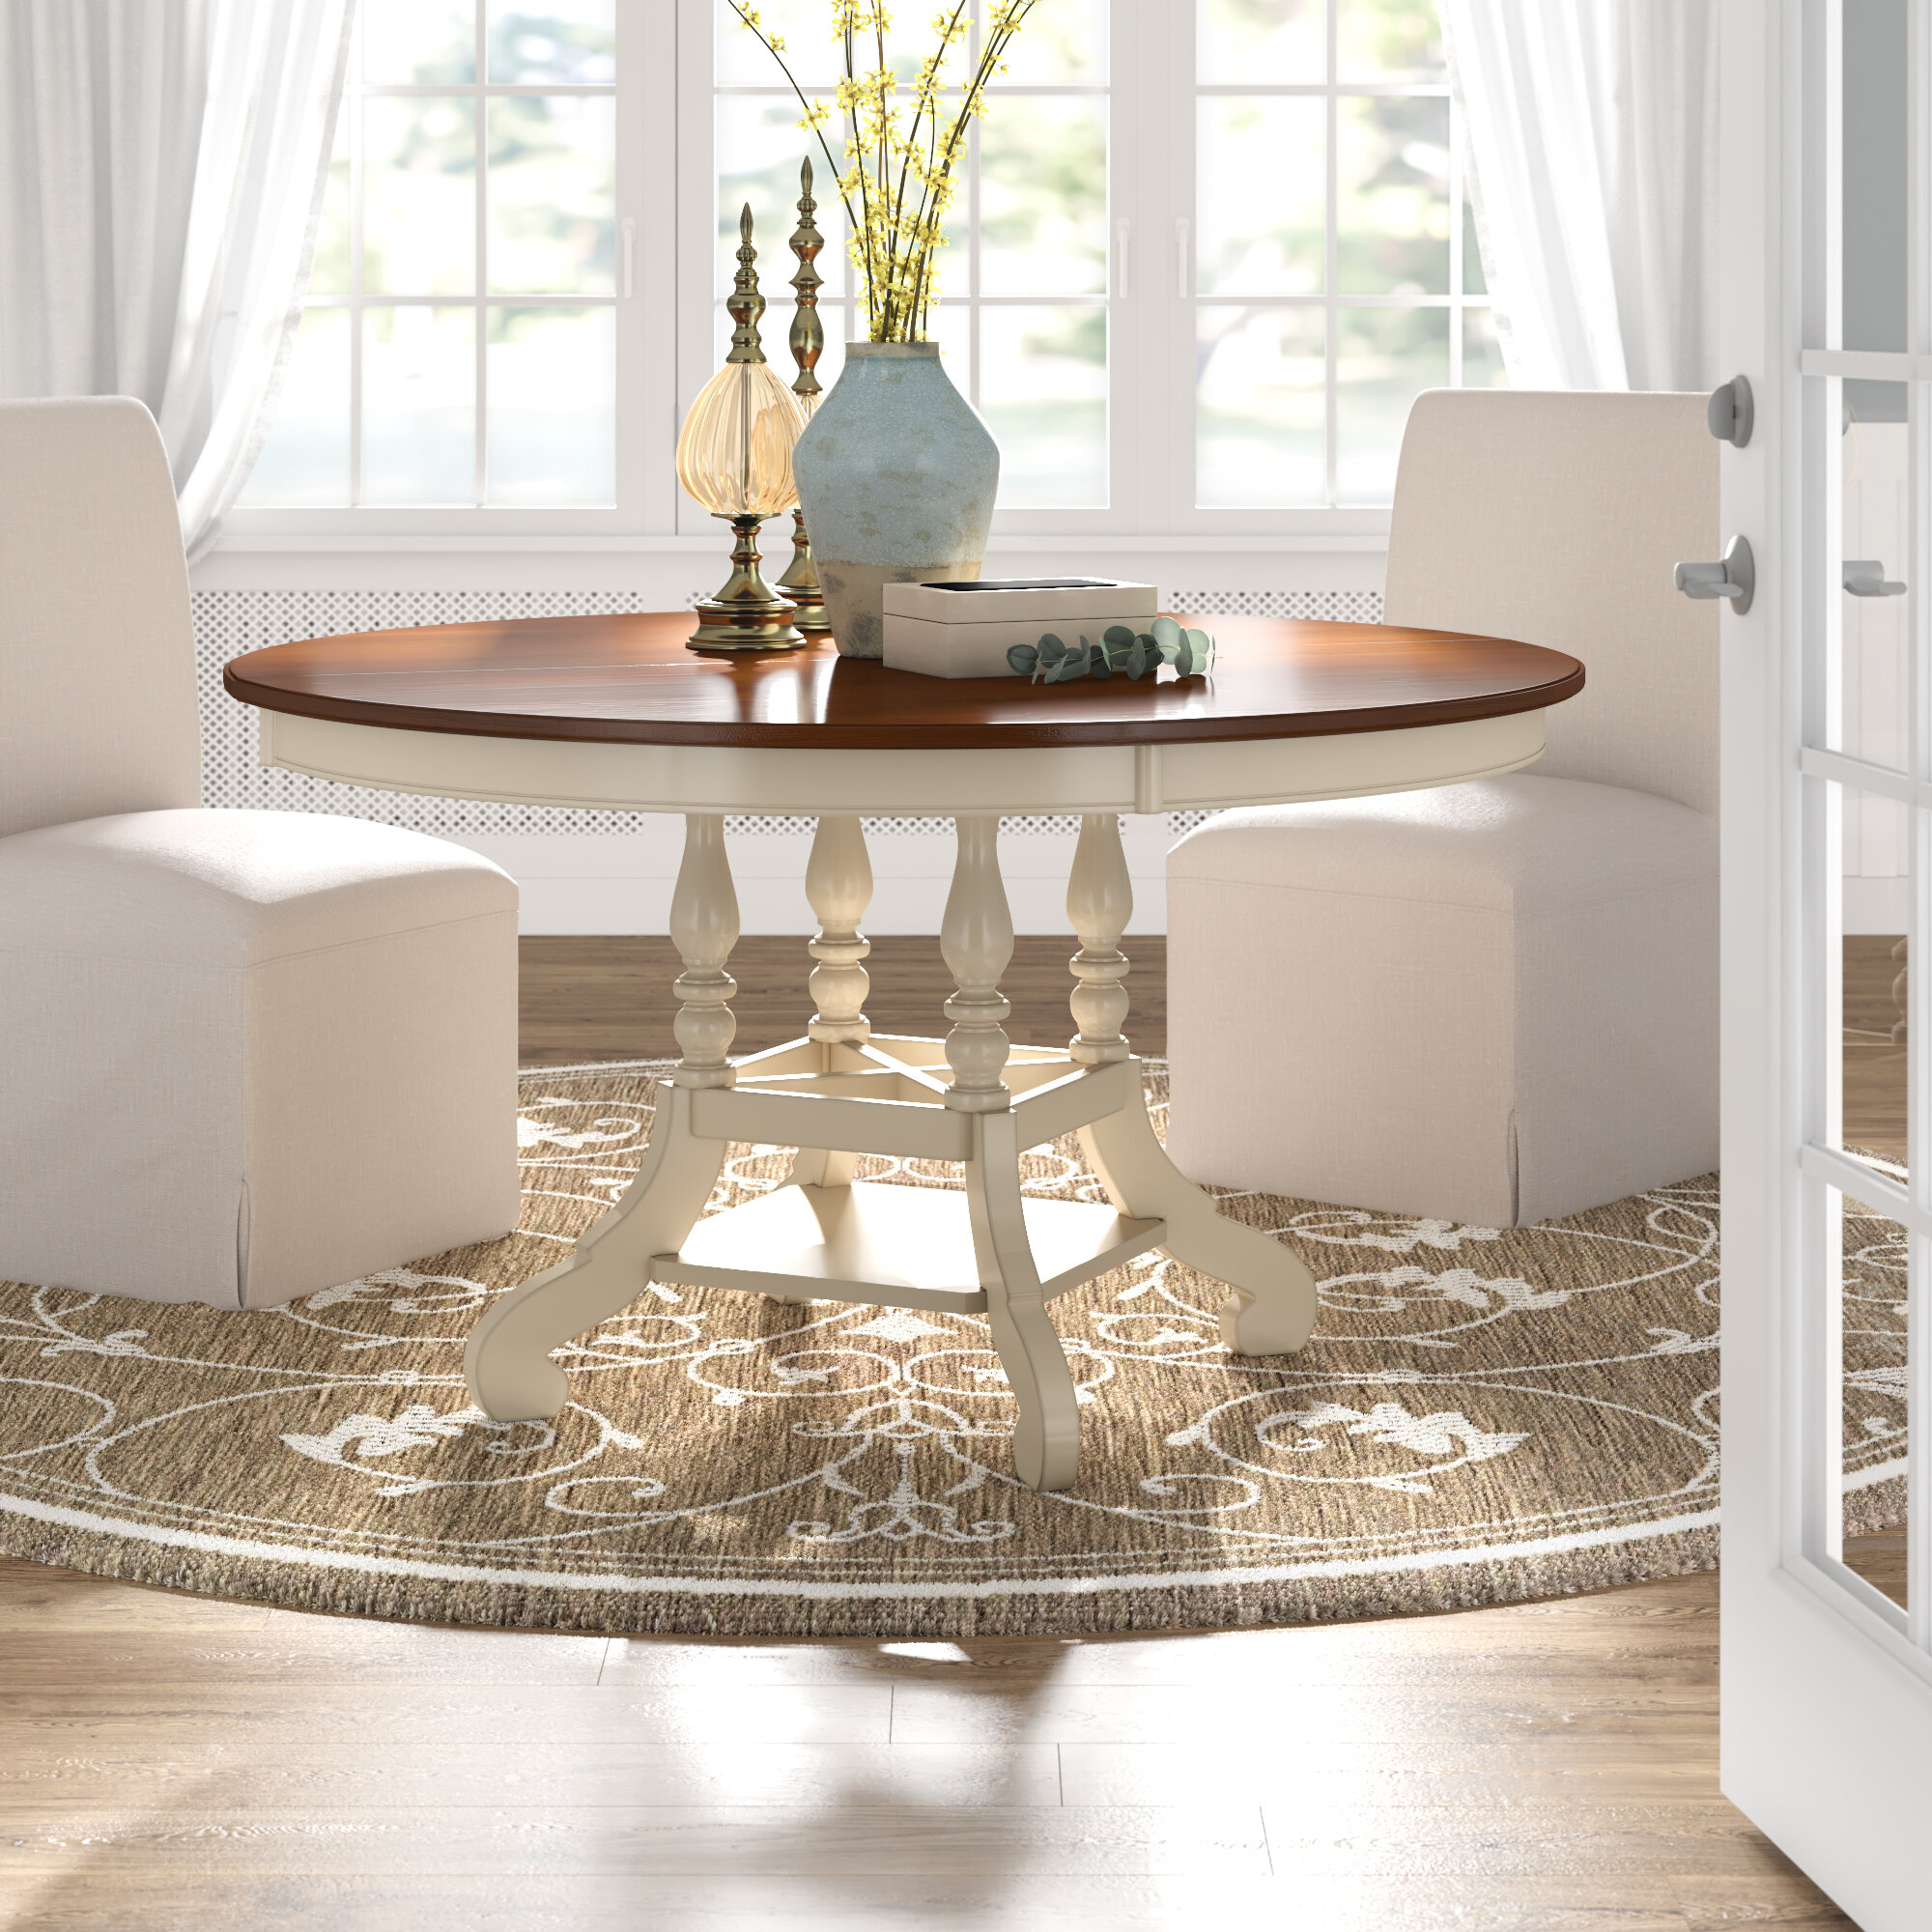 Laurel Foundry Modern Farmhouse Irizarry Extendable Pine Solid Wood Dining Table Reviews Wayfair